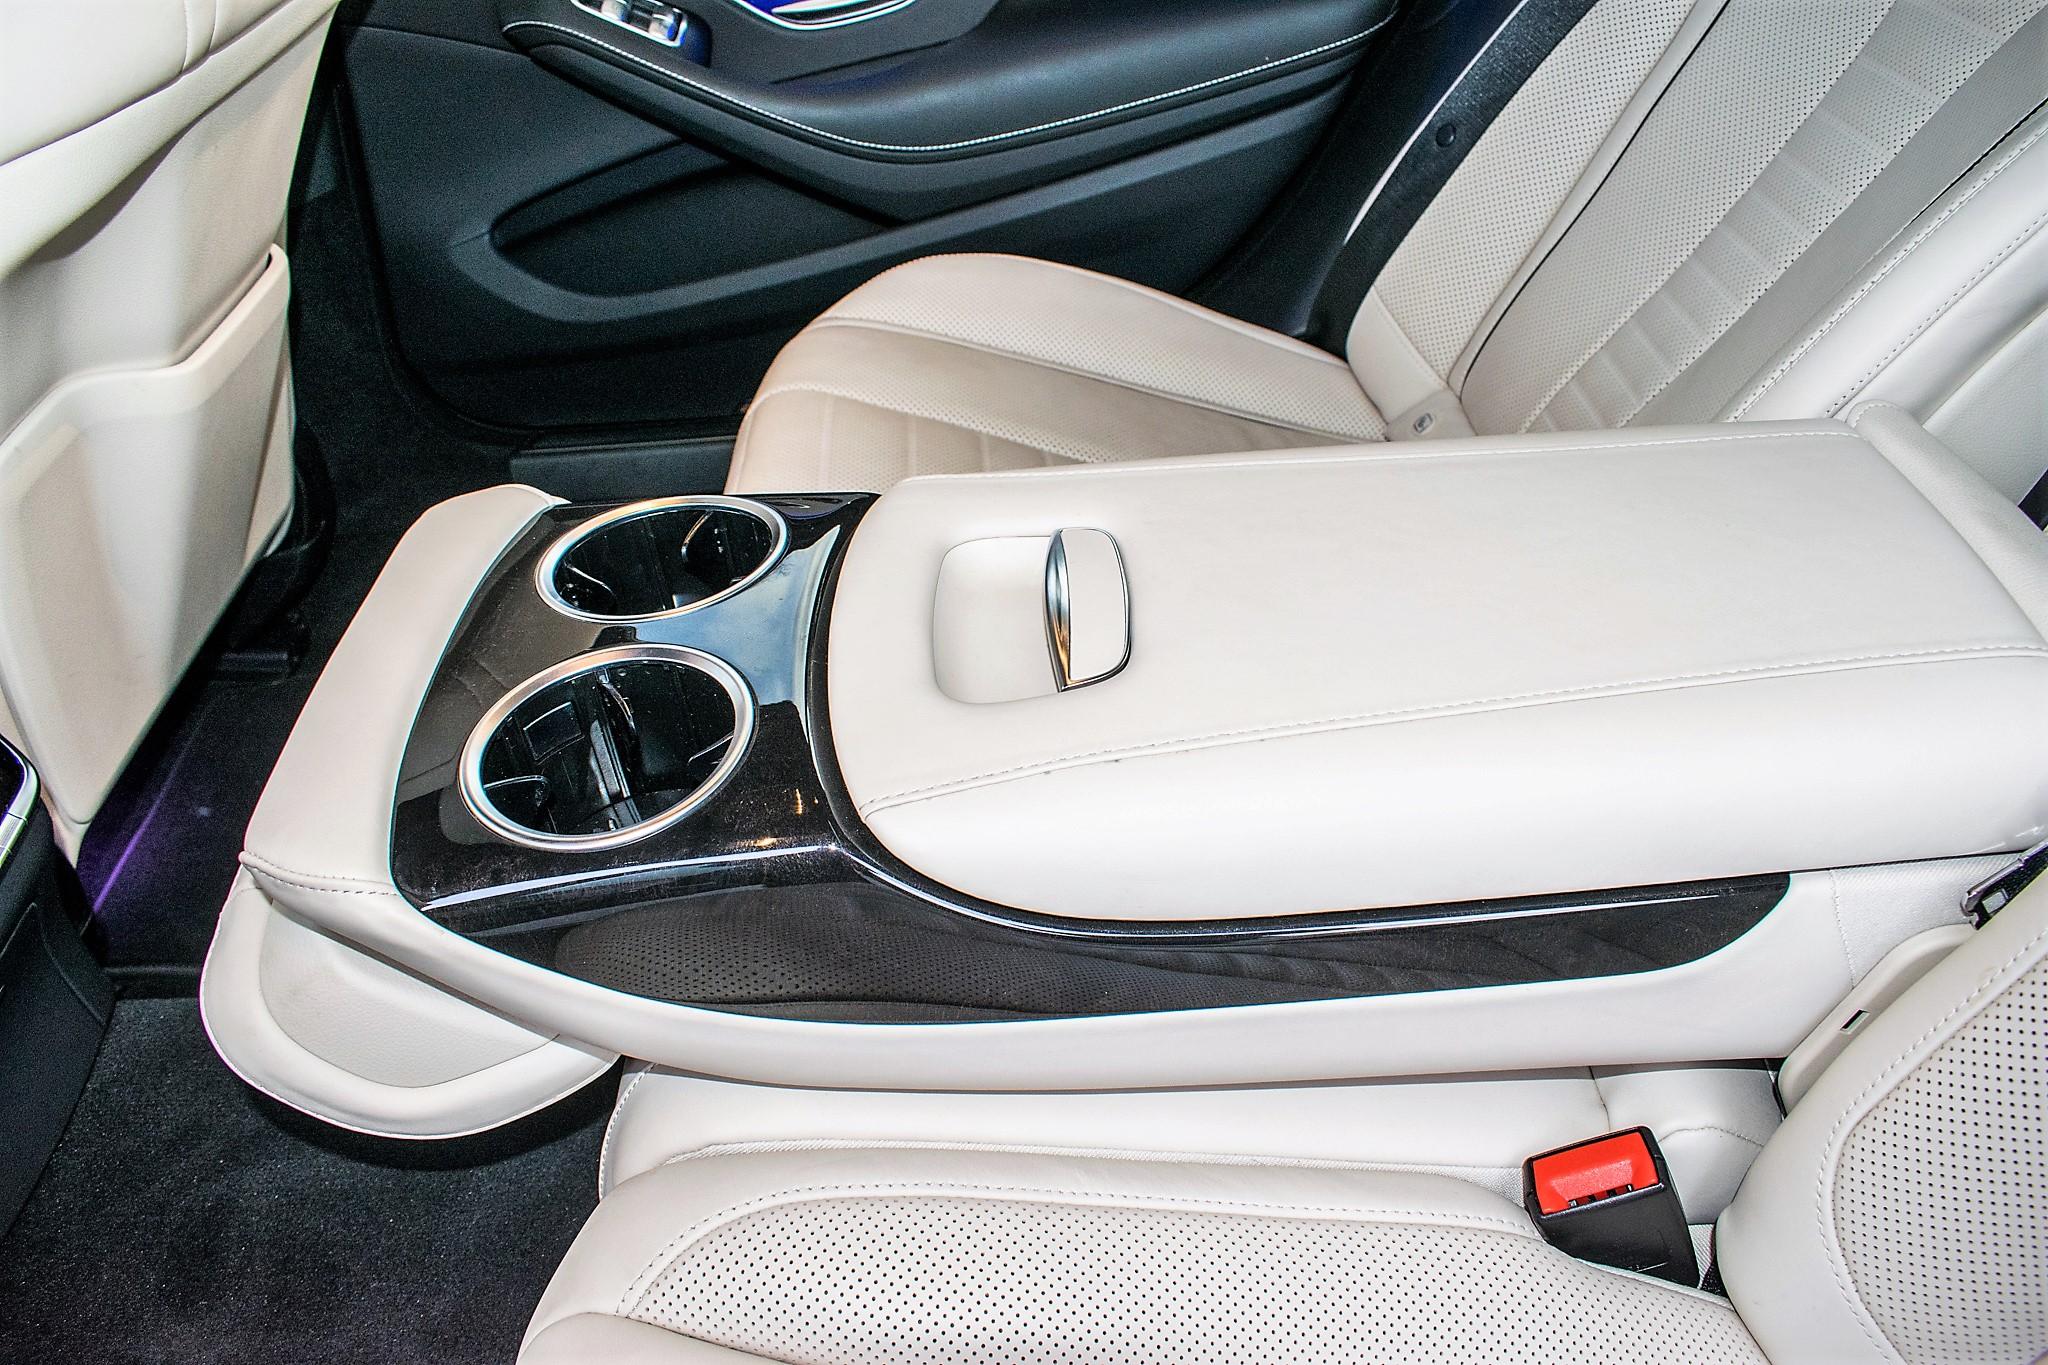 Mercedes Benz S450 L AMG Line Executive auto petrol 4 door saloon car Registration Number: FX68 - Image 28 of 33